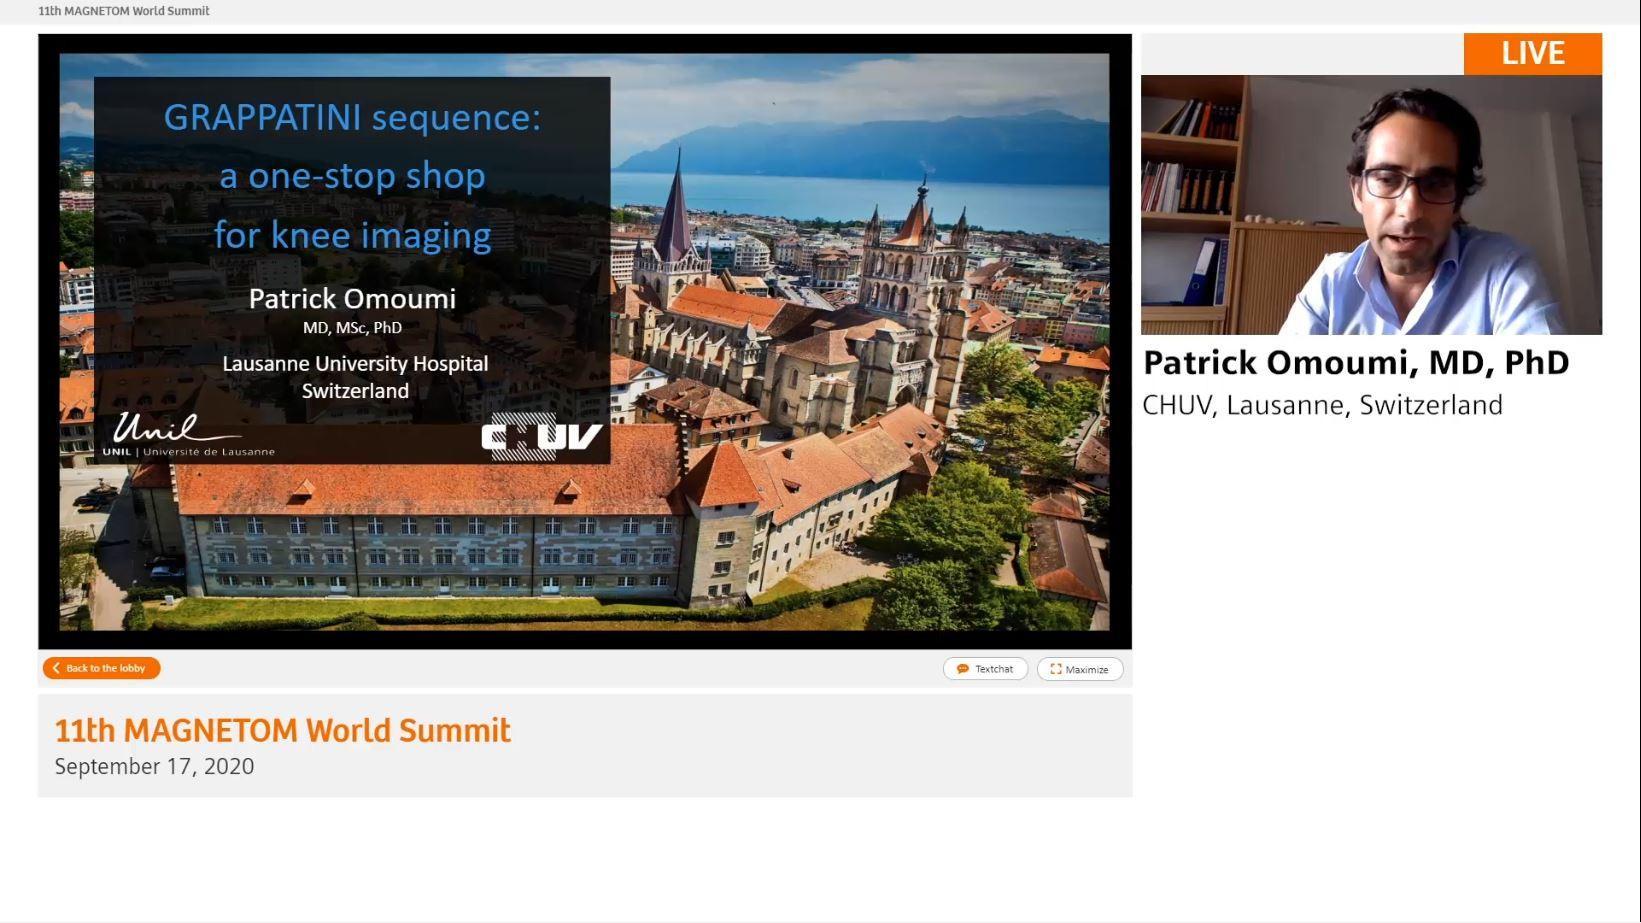 Preview Clinical Talk Patrick Omoumi